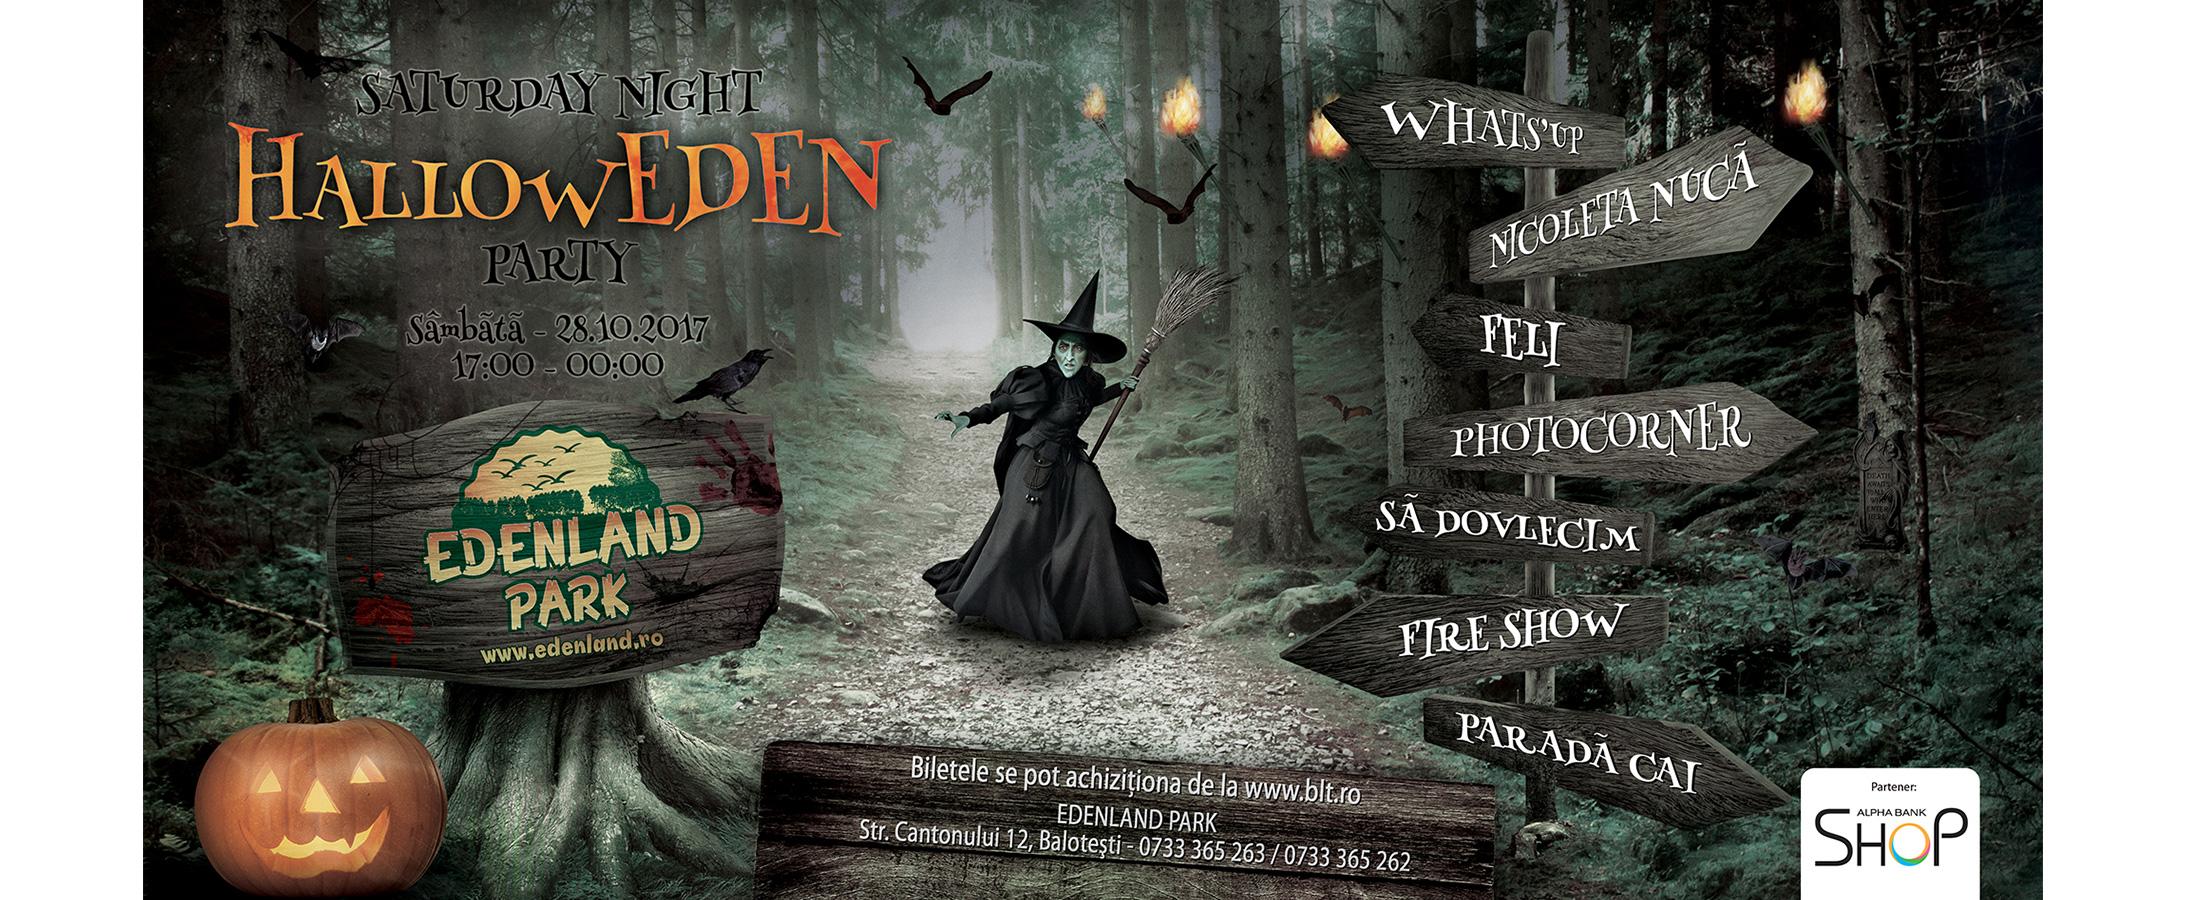 Halloween-Edenland